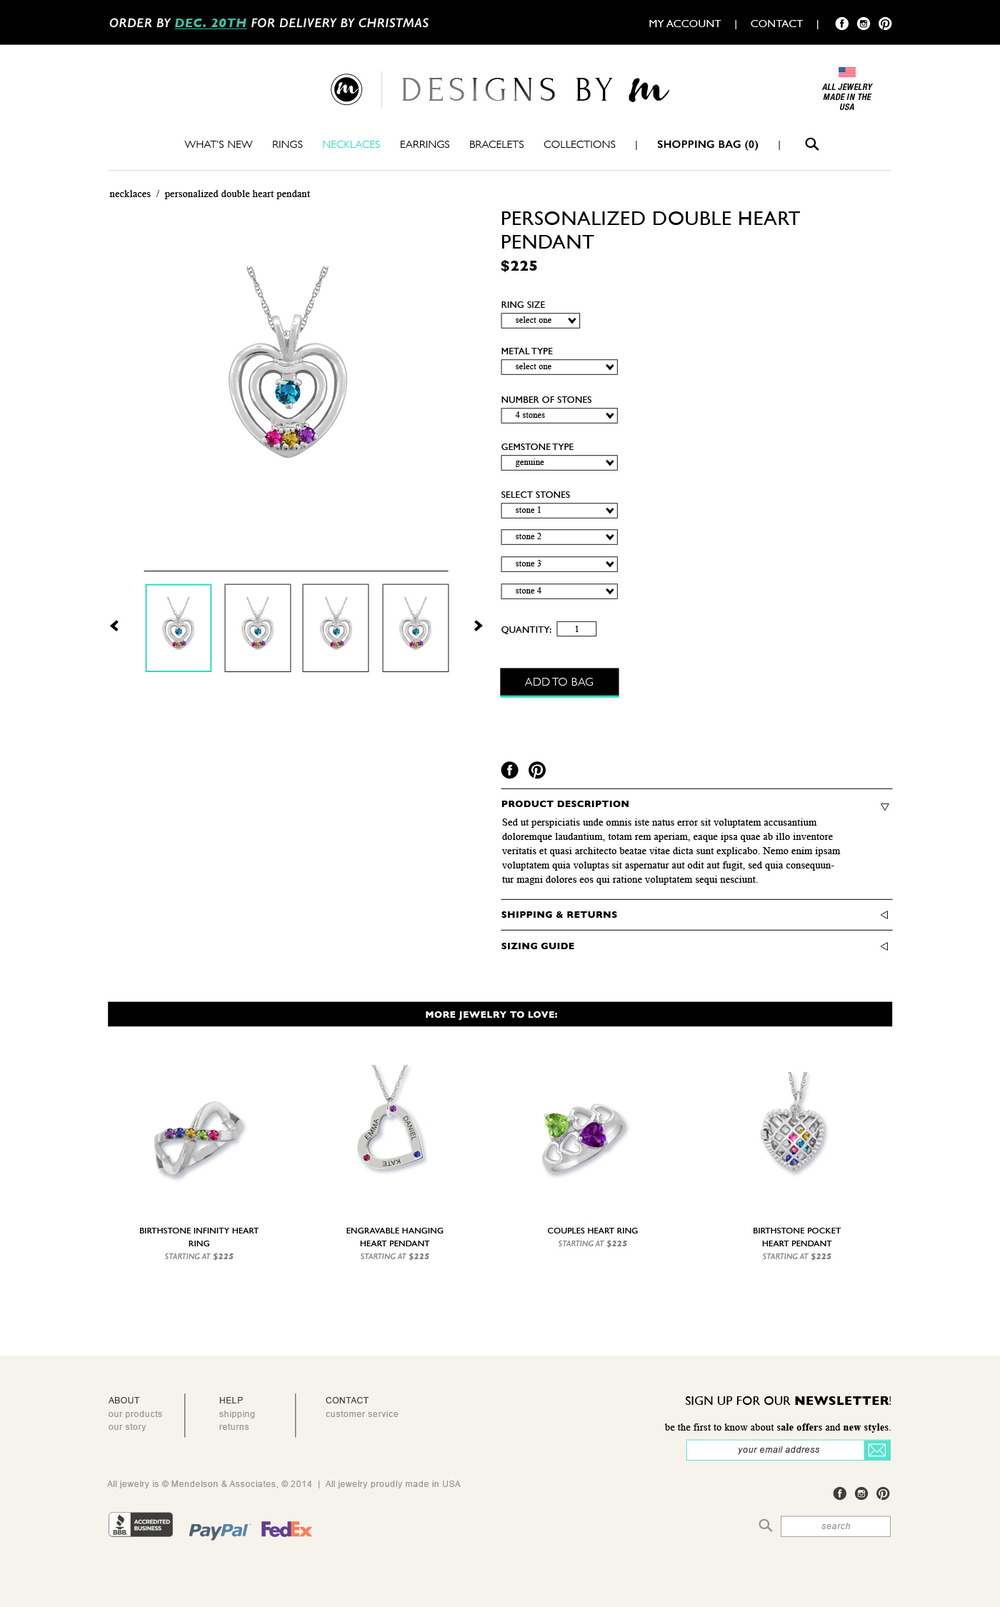 designsbym_single_v2.jpg